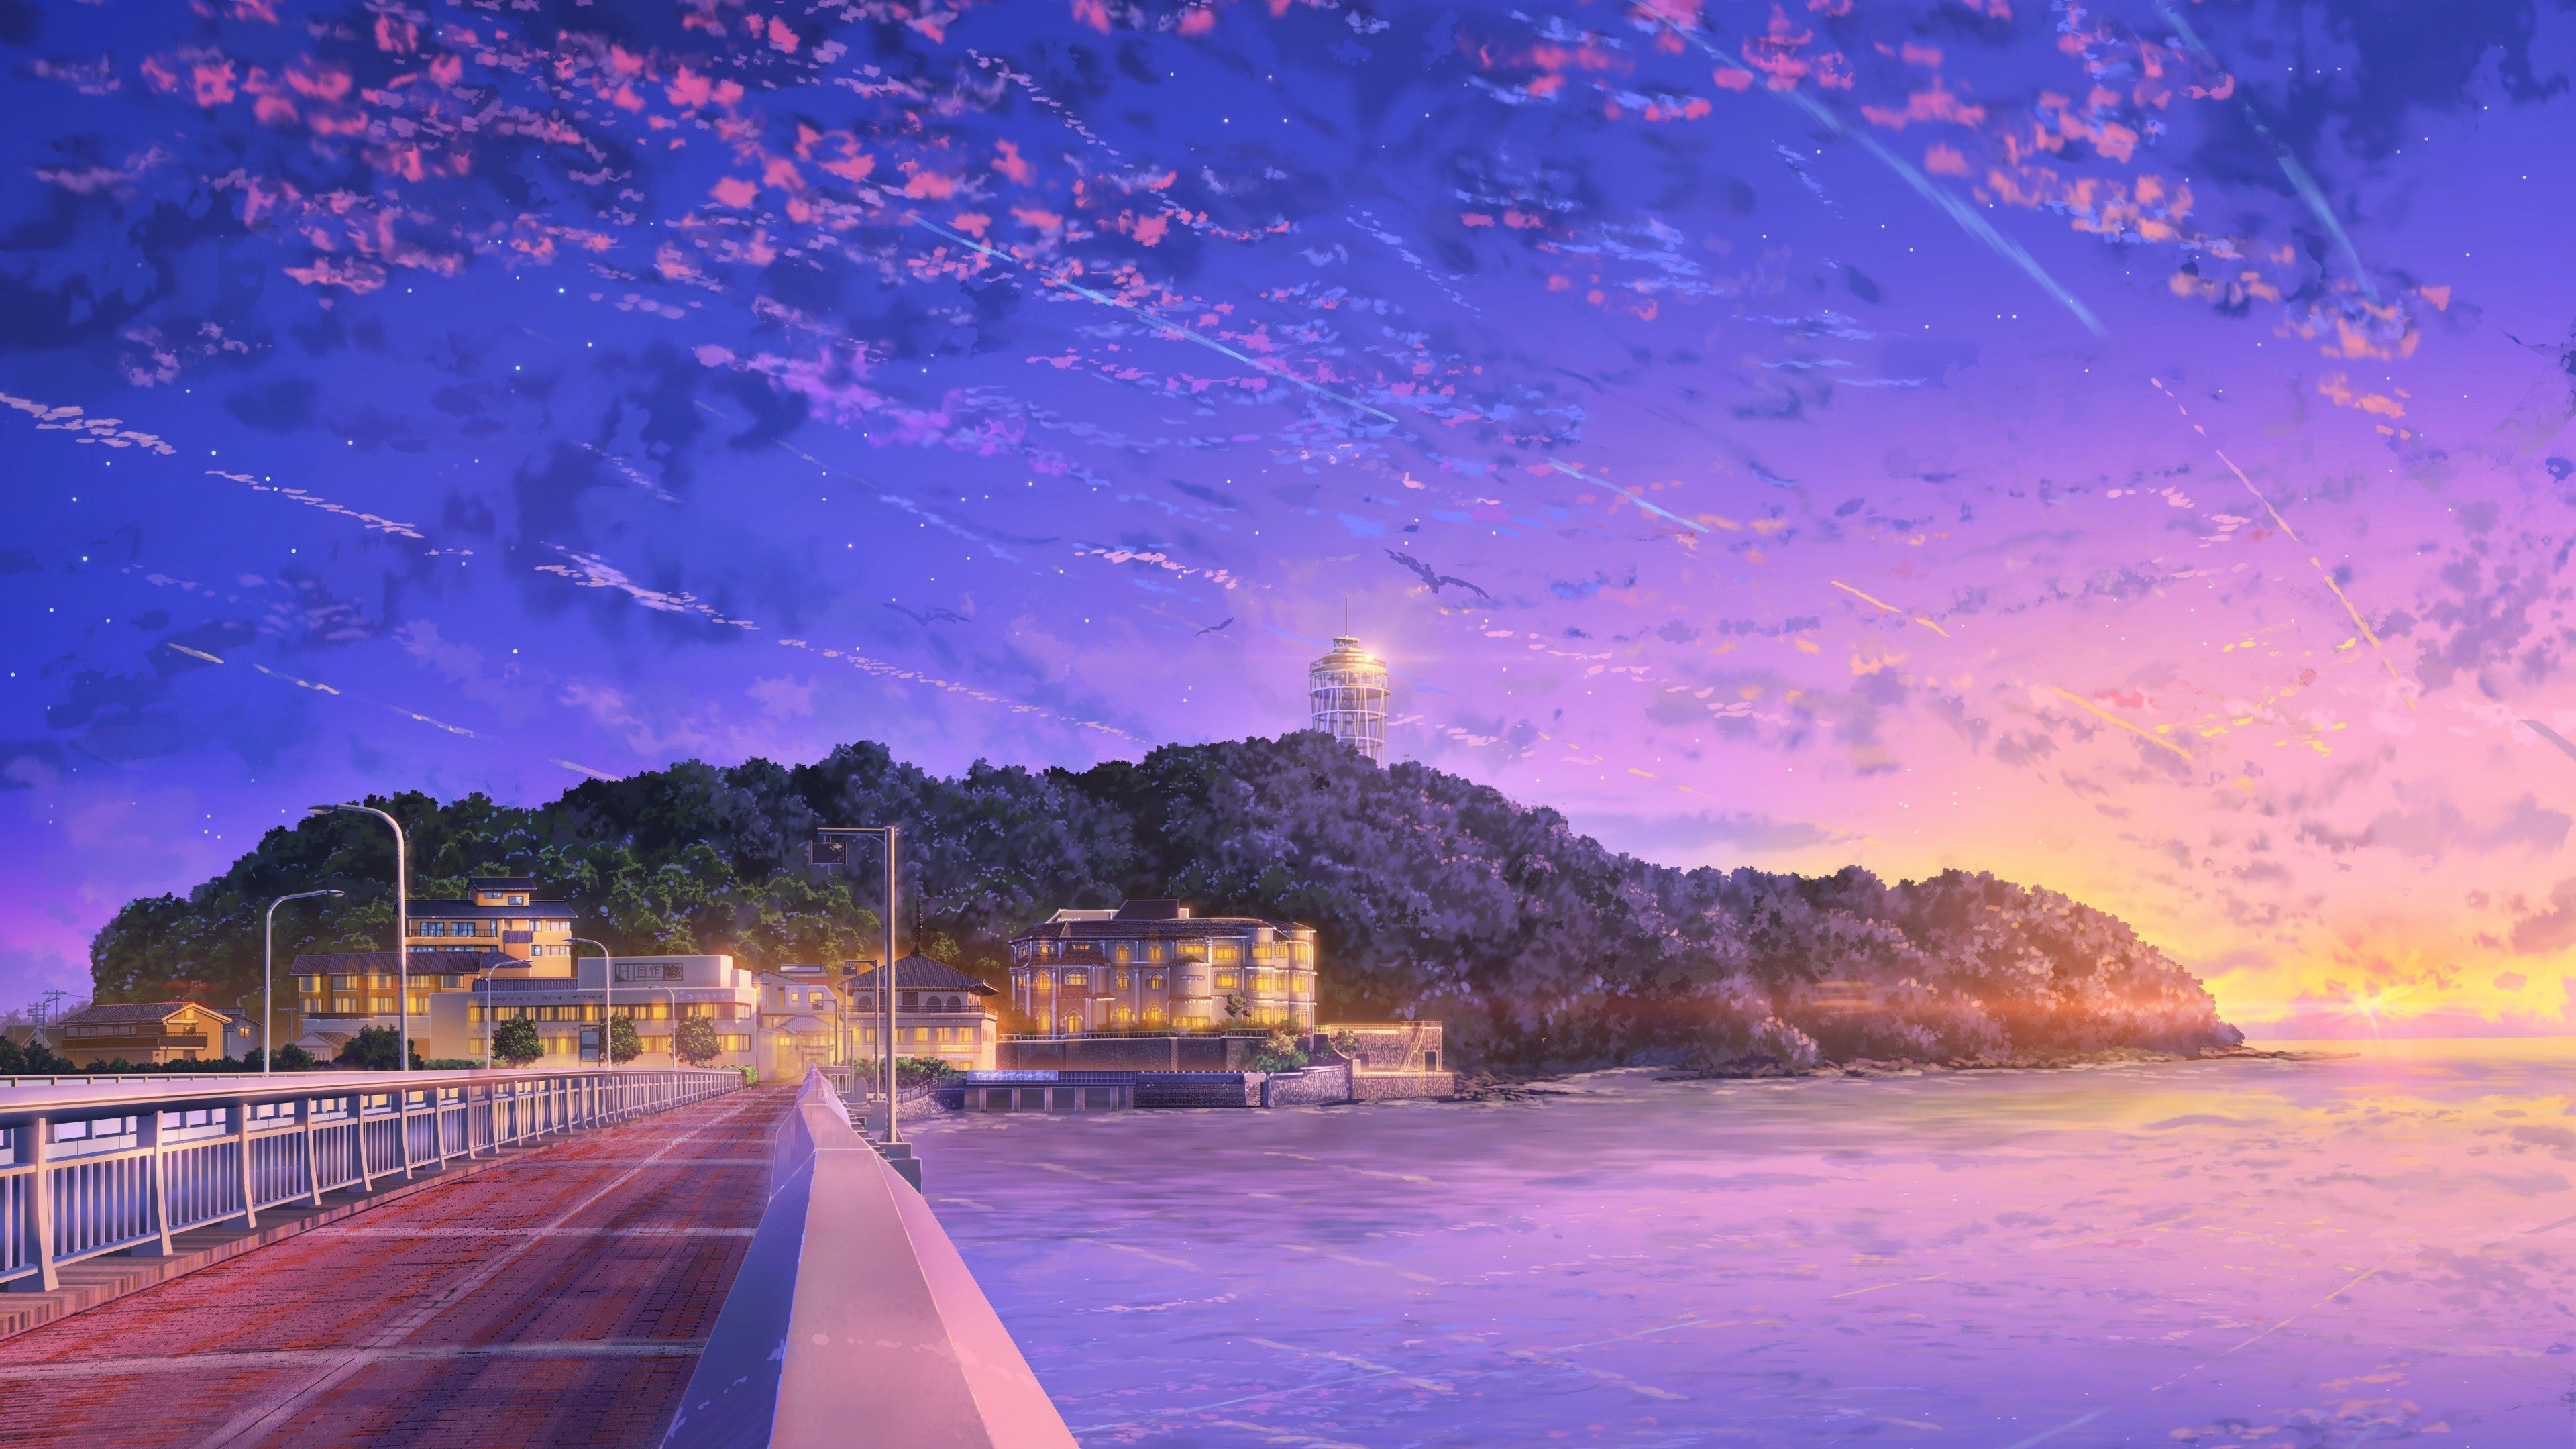 Hd 4k Anime Landscape Wallpapers Wallpaper Cave